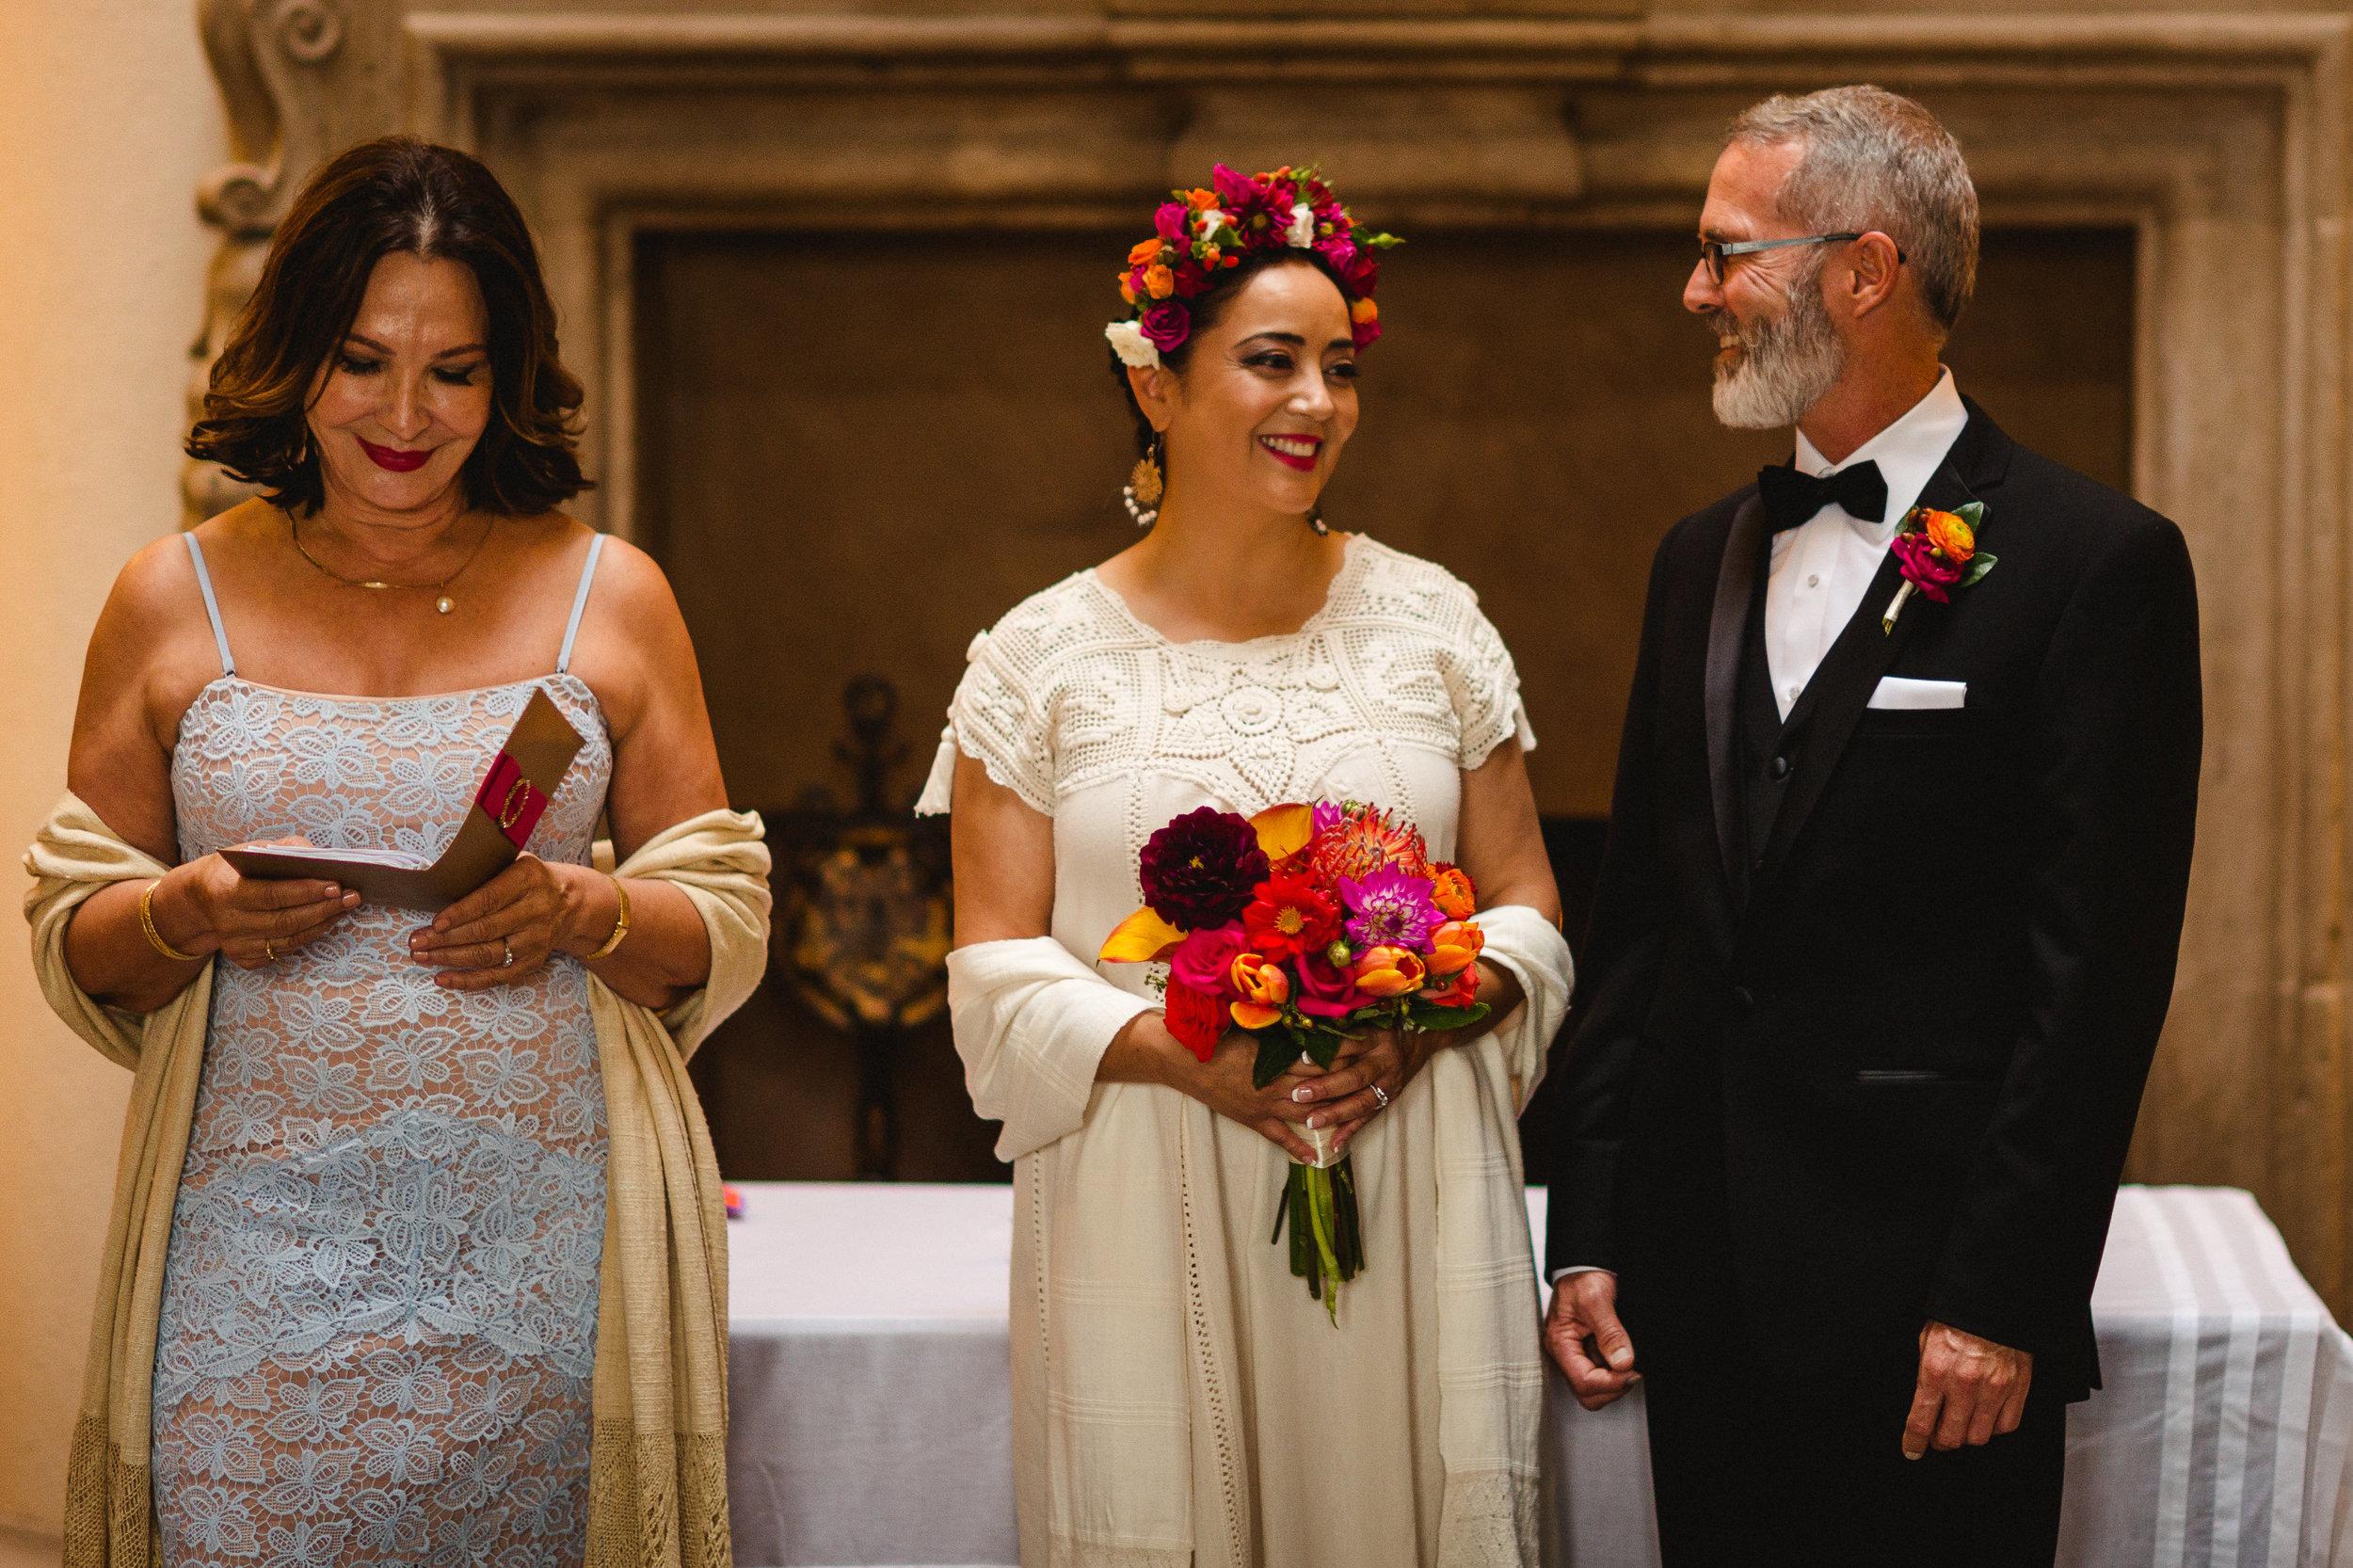 MaurizioSolisBroca-casa-carino-san-miguel-de-allende-wedding-57.jpg